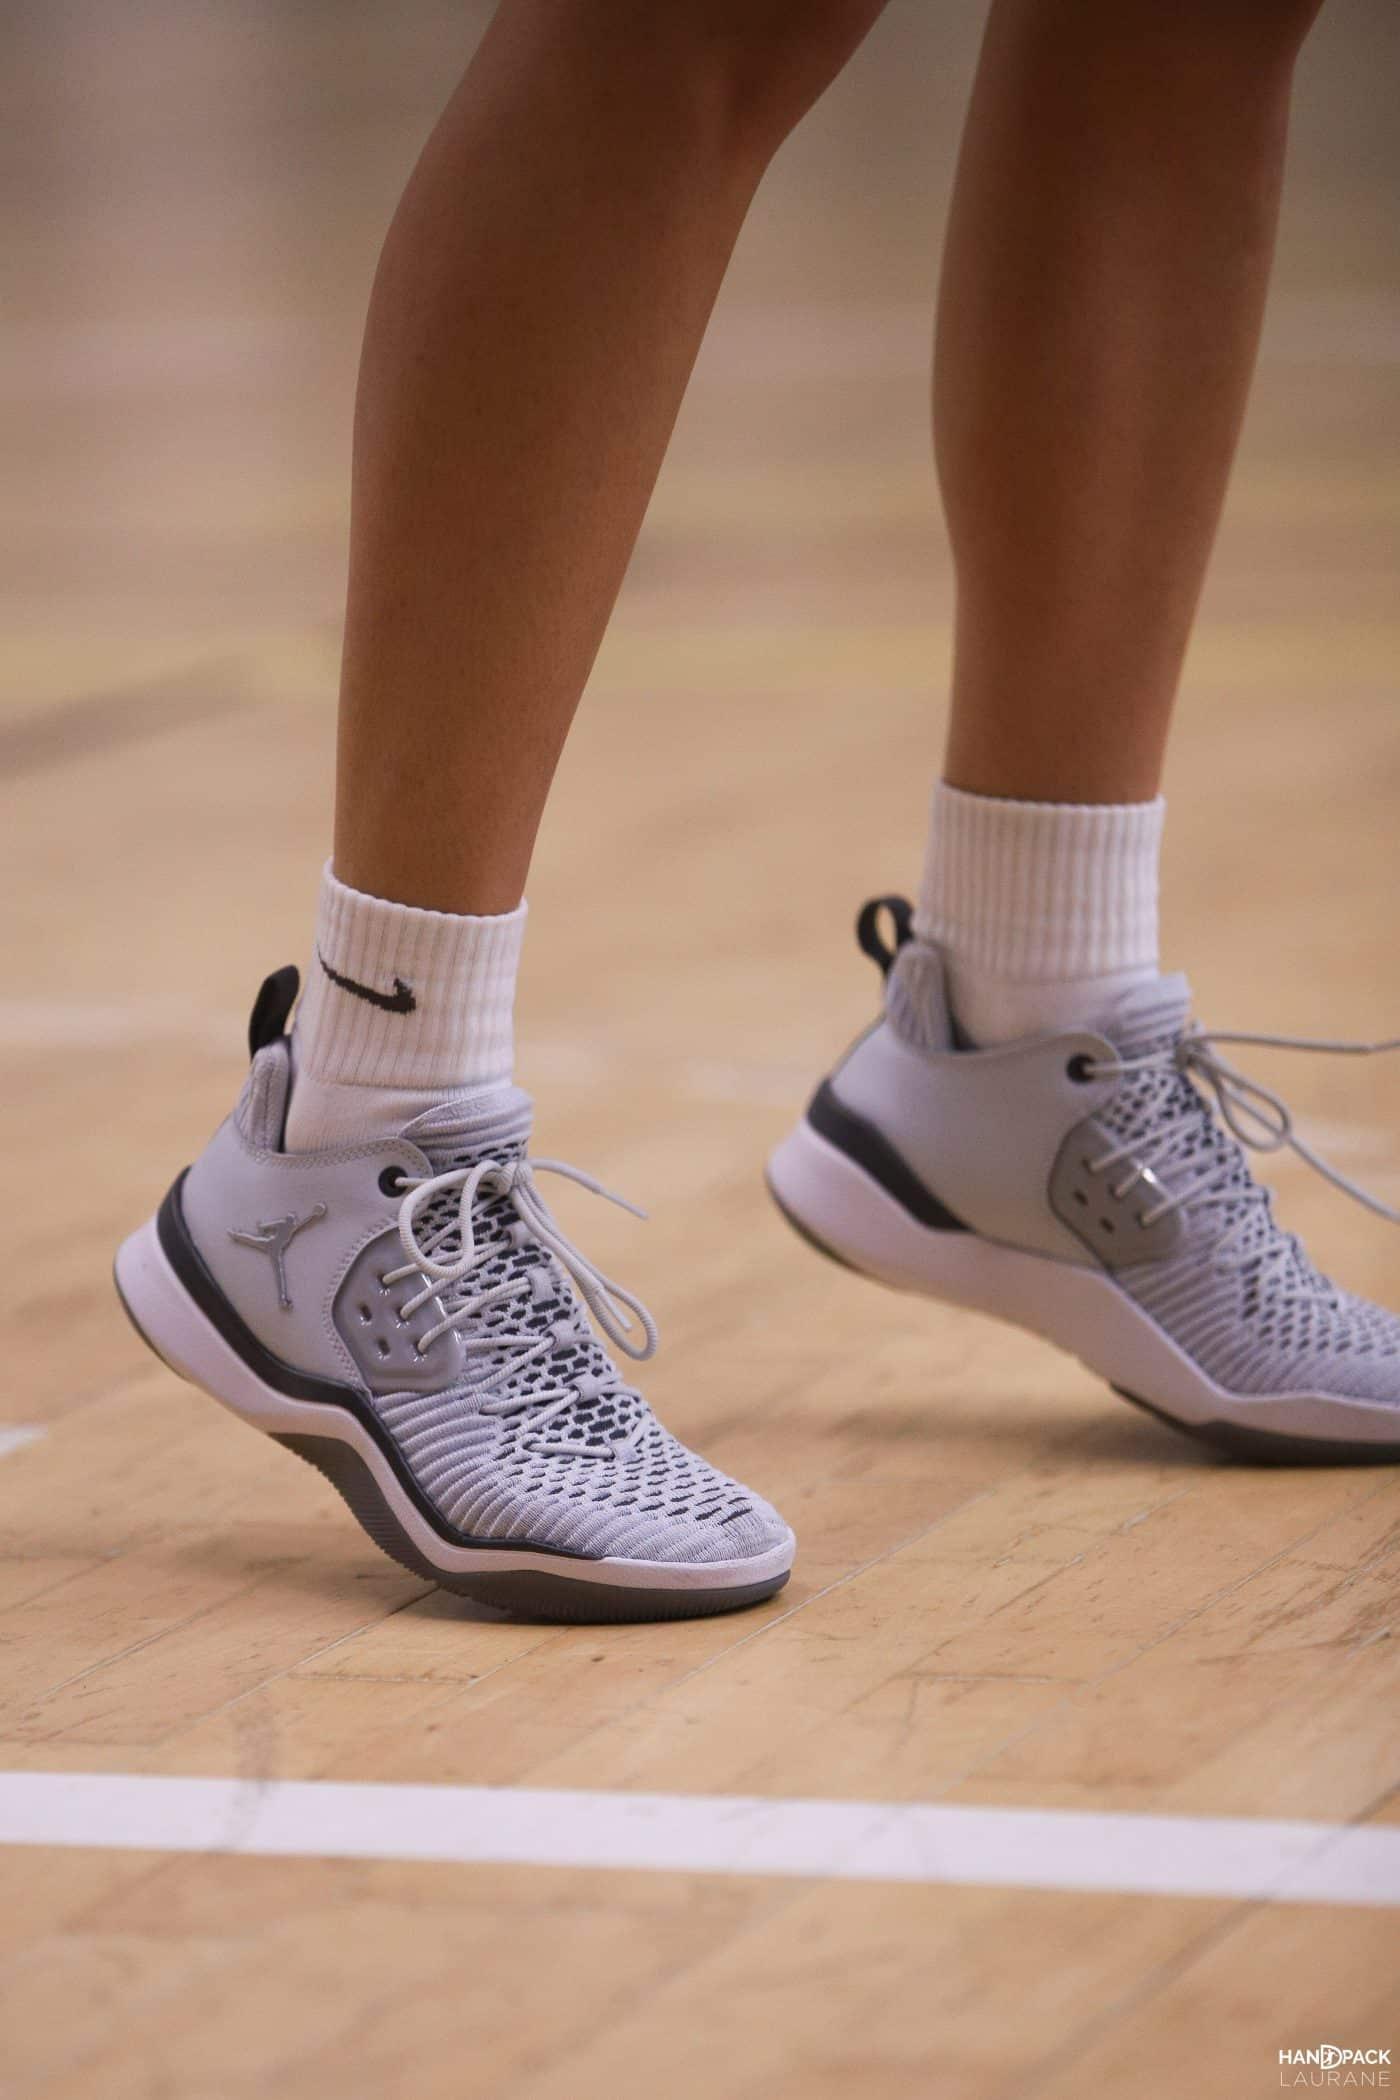 test-chaussures-jordan-dna-lx-handpack-12